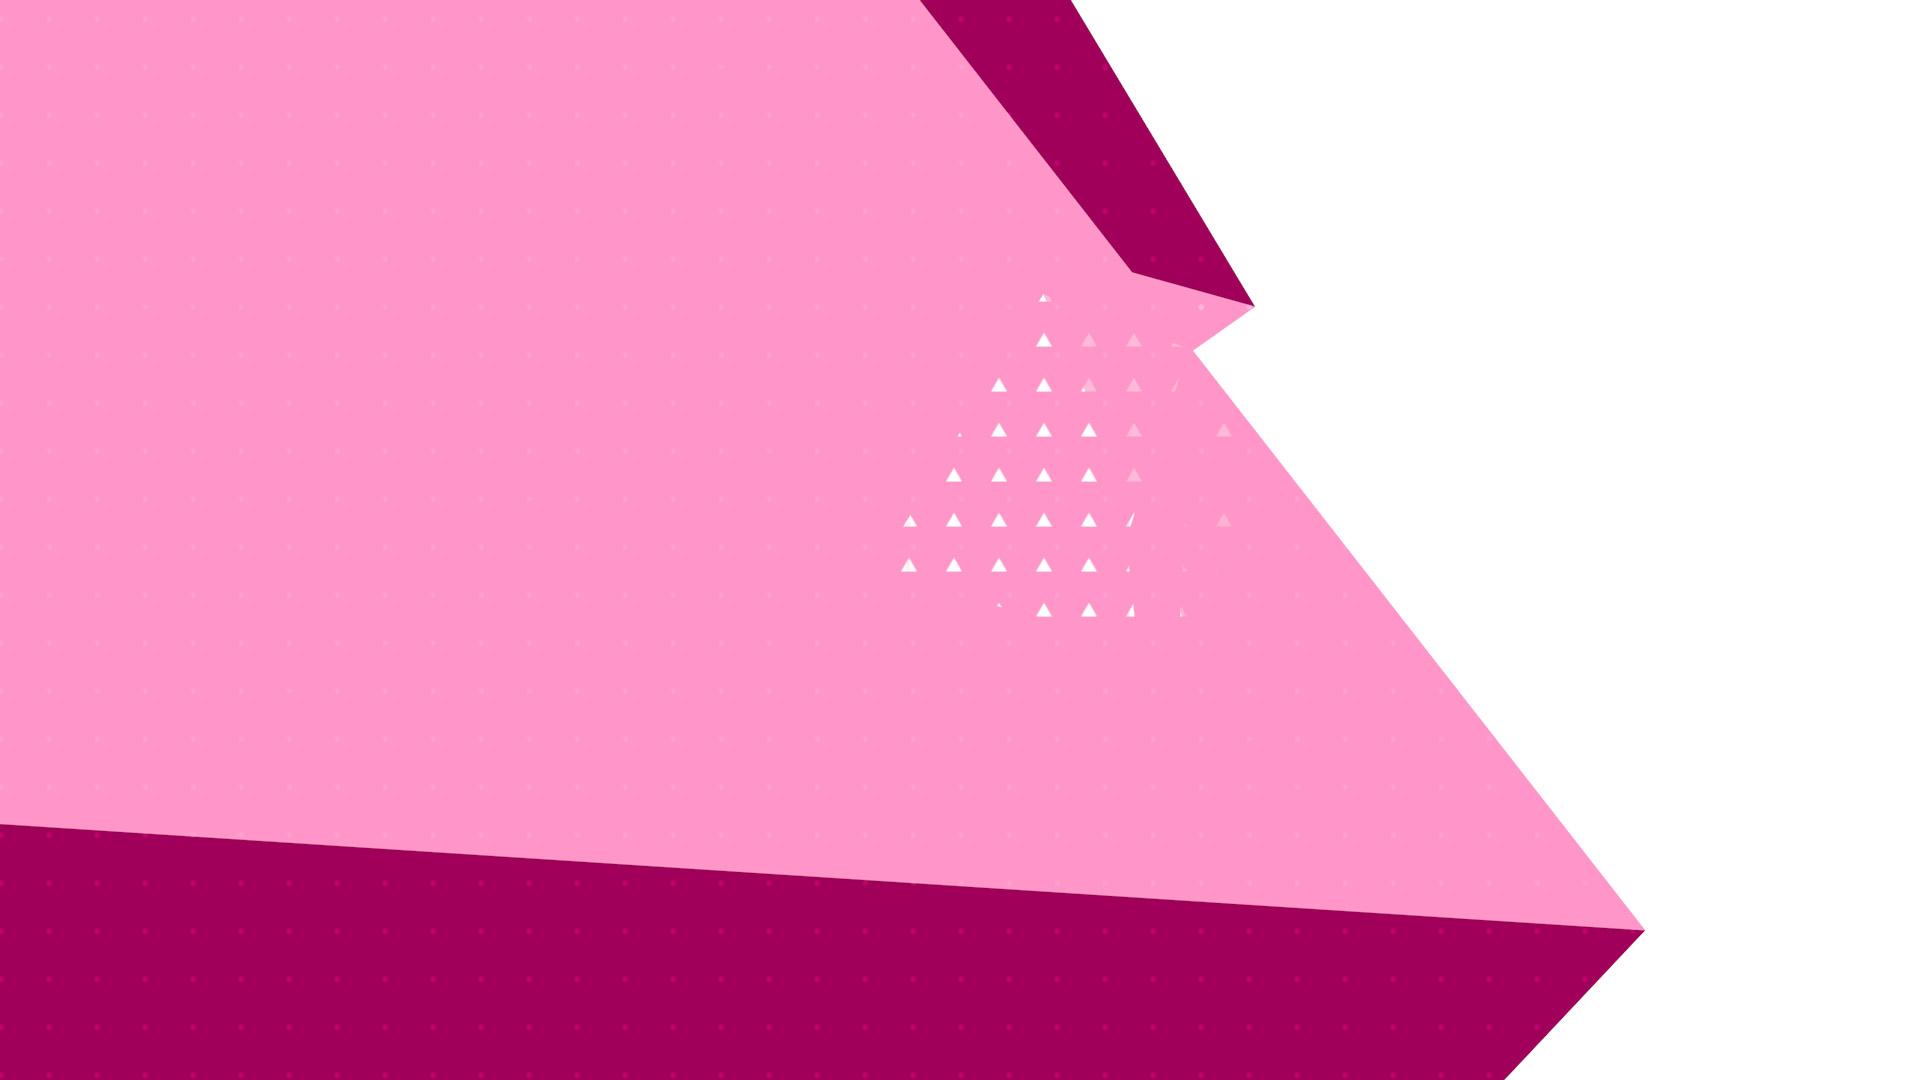 wipe_3_pink116